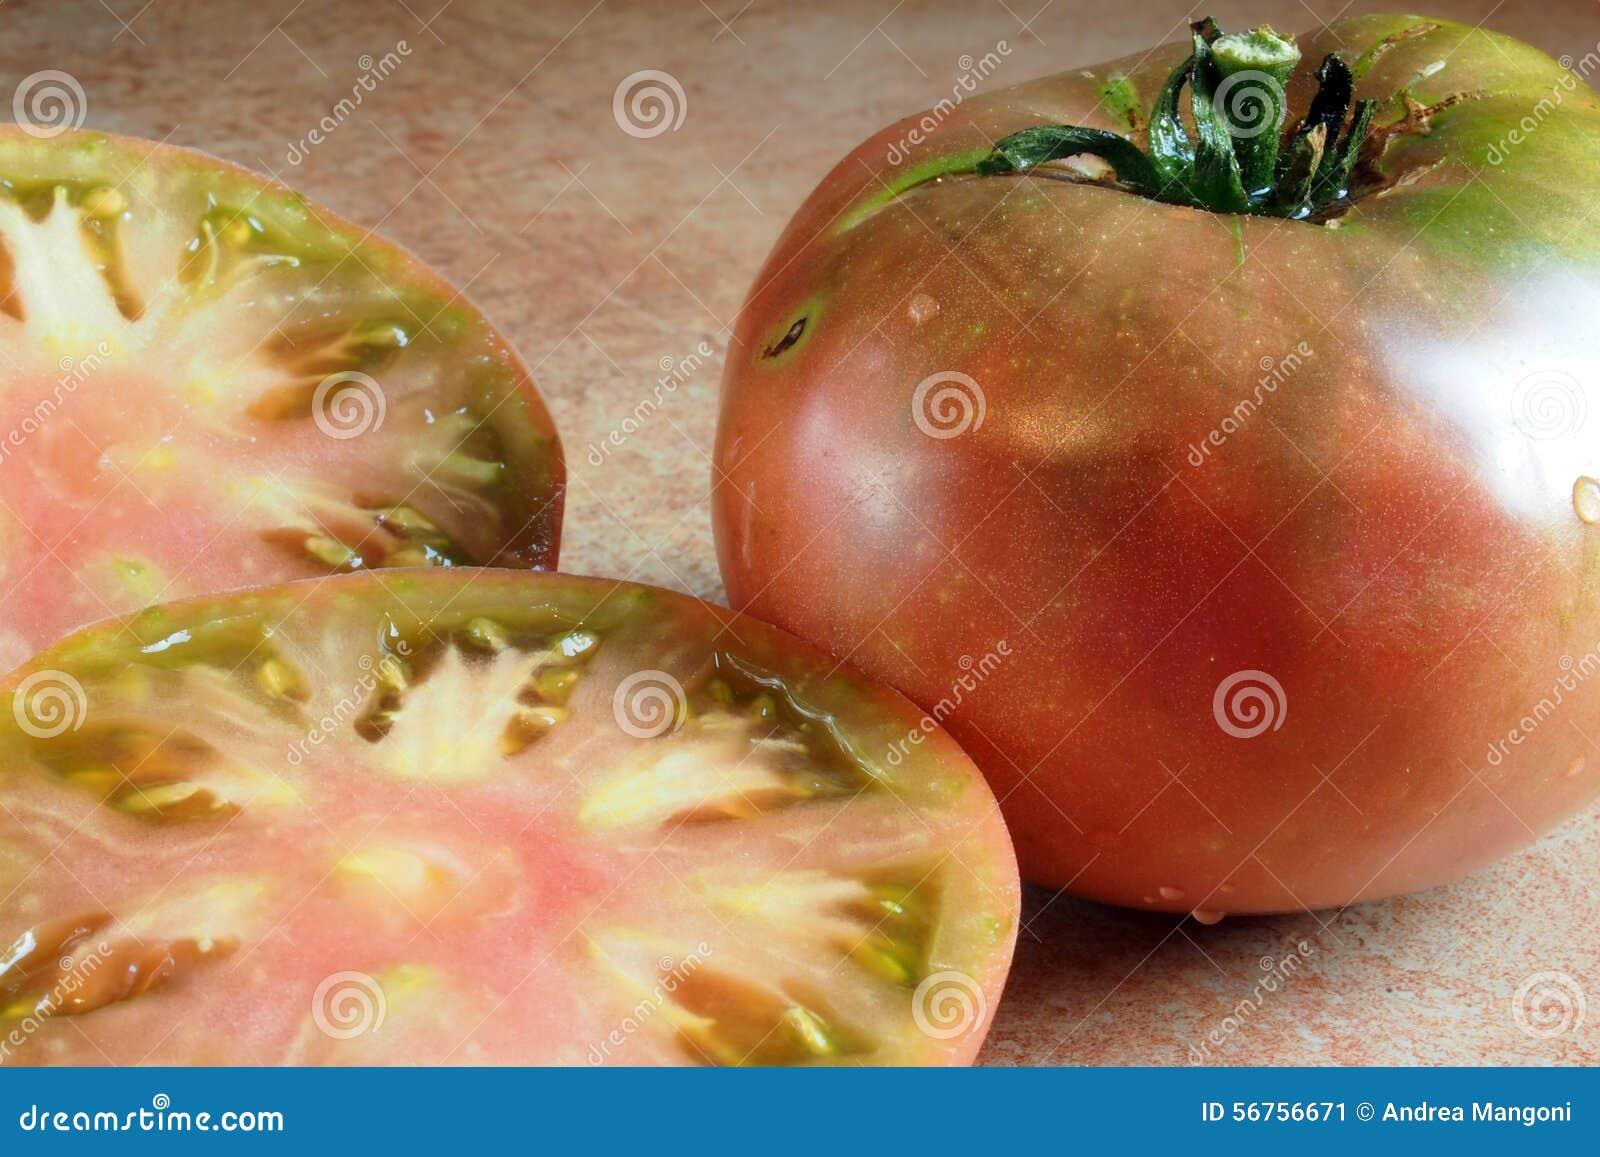 Pomodoro porpora cherokee affettato